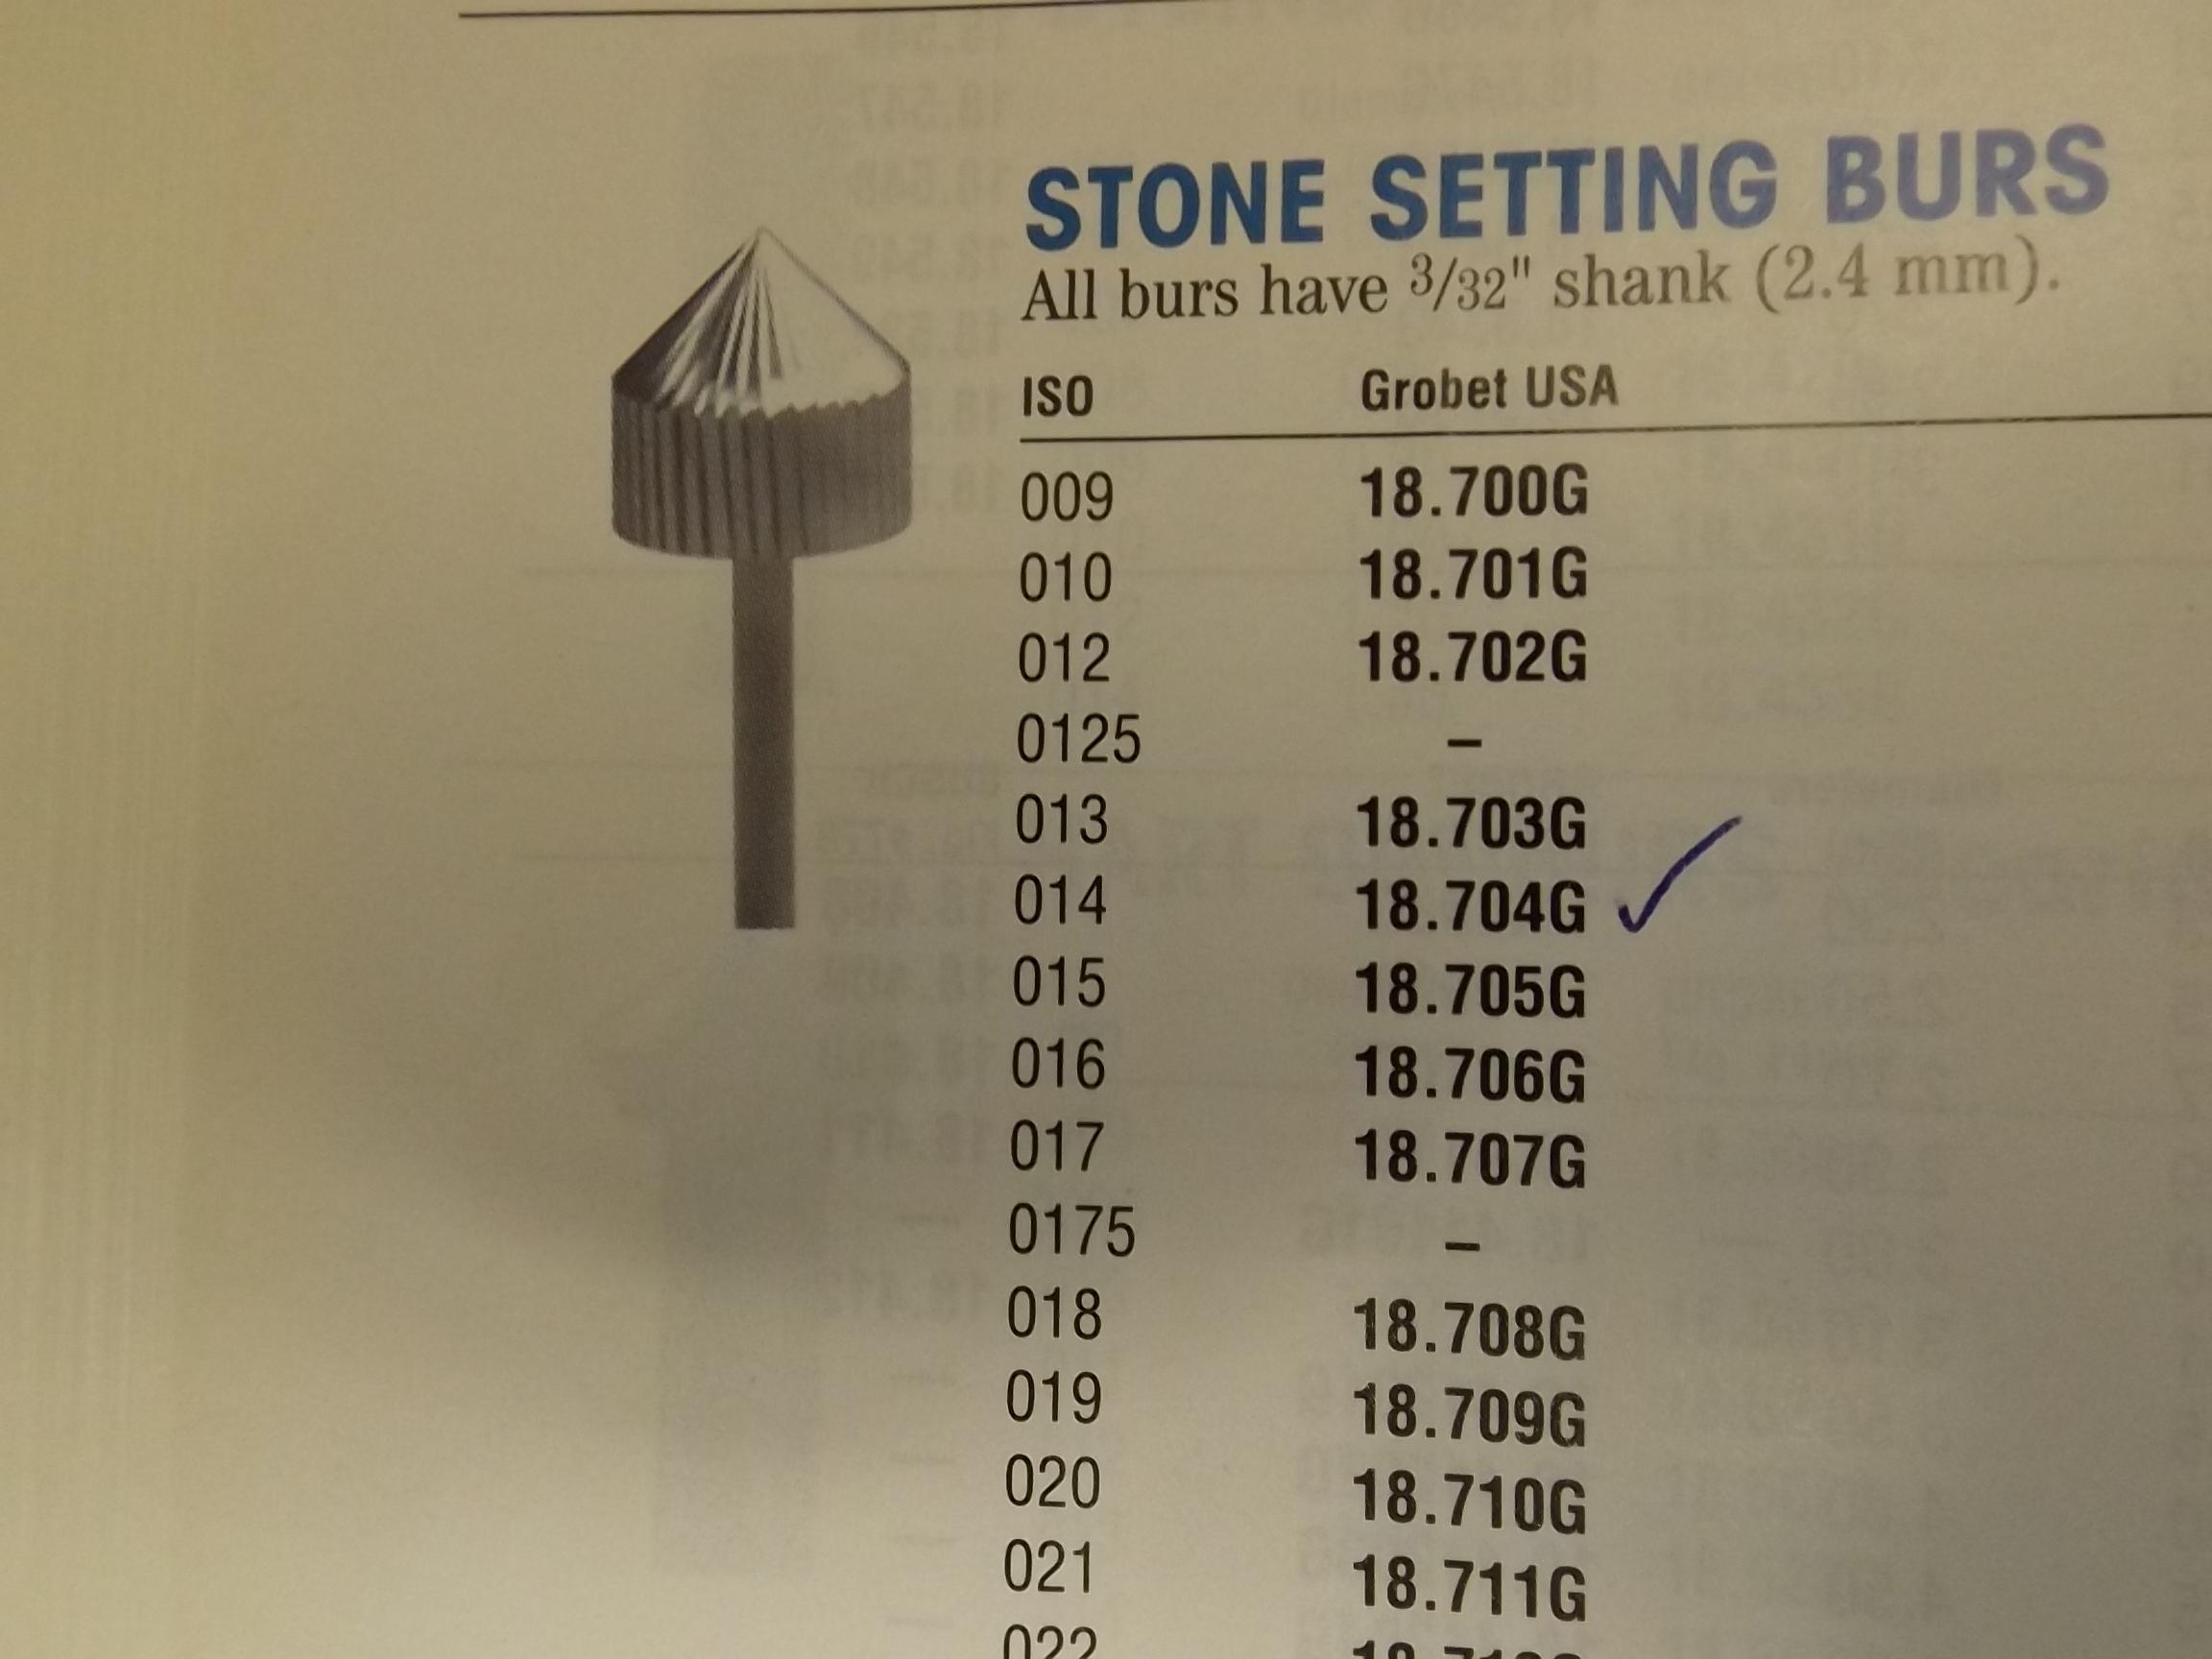 BR717G Stone Setting Burs Grobet Brand-- Similar to Busch- 18.717G